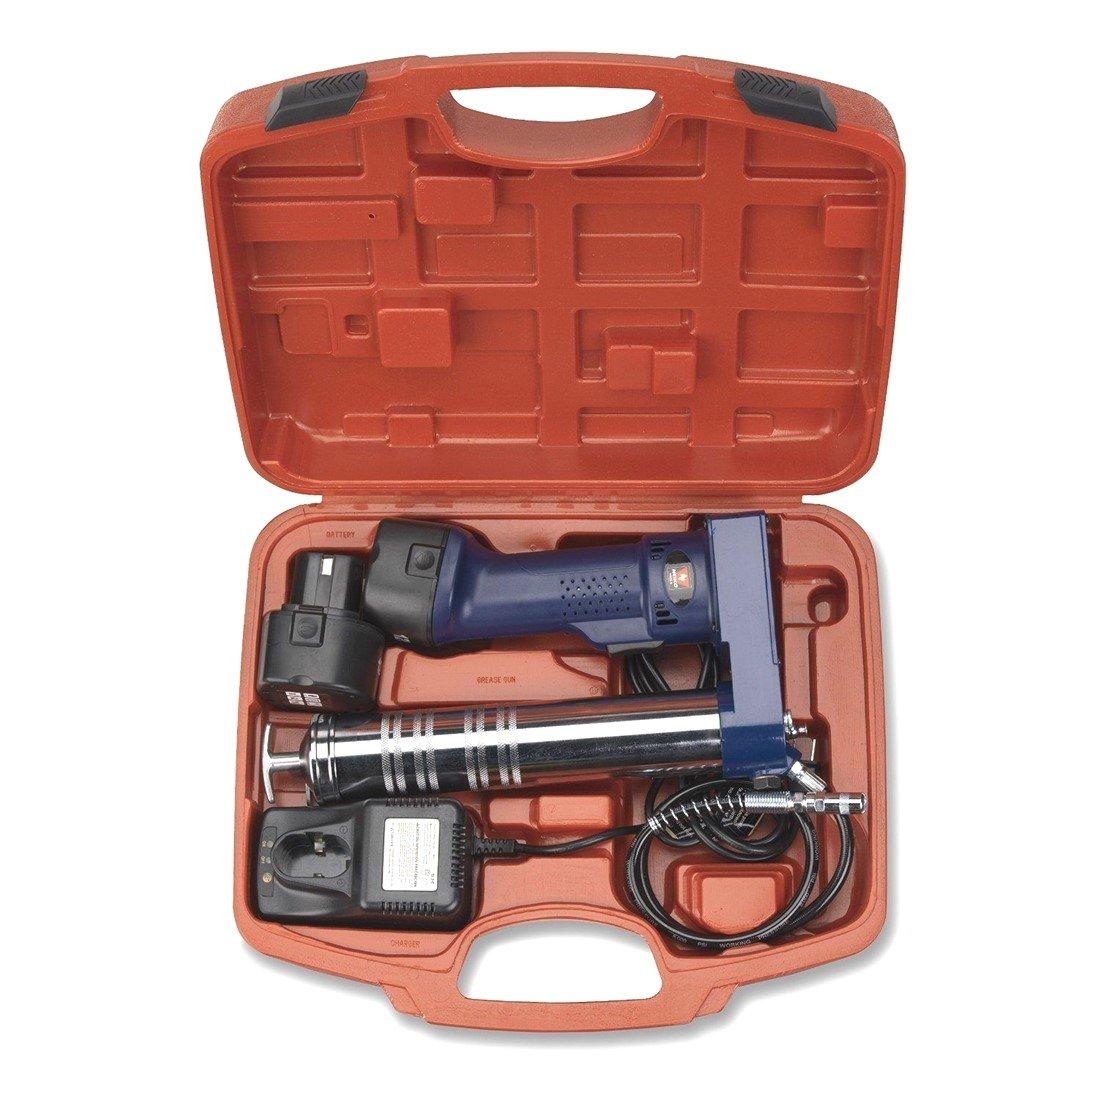 Cordless Rechargeable Grease Gun | 2 x 12V Battery Automotive Mechanics Tool